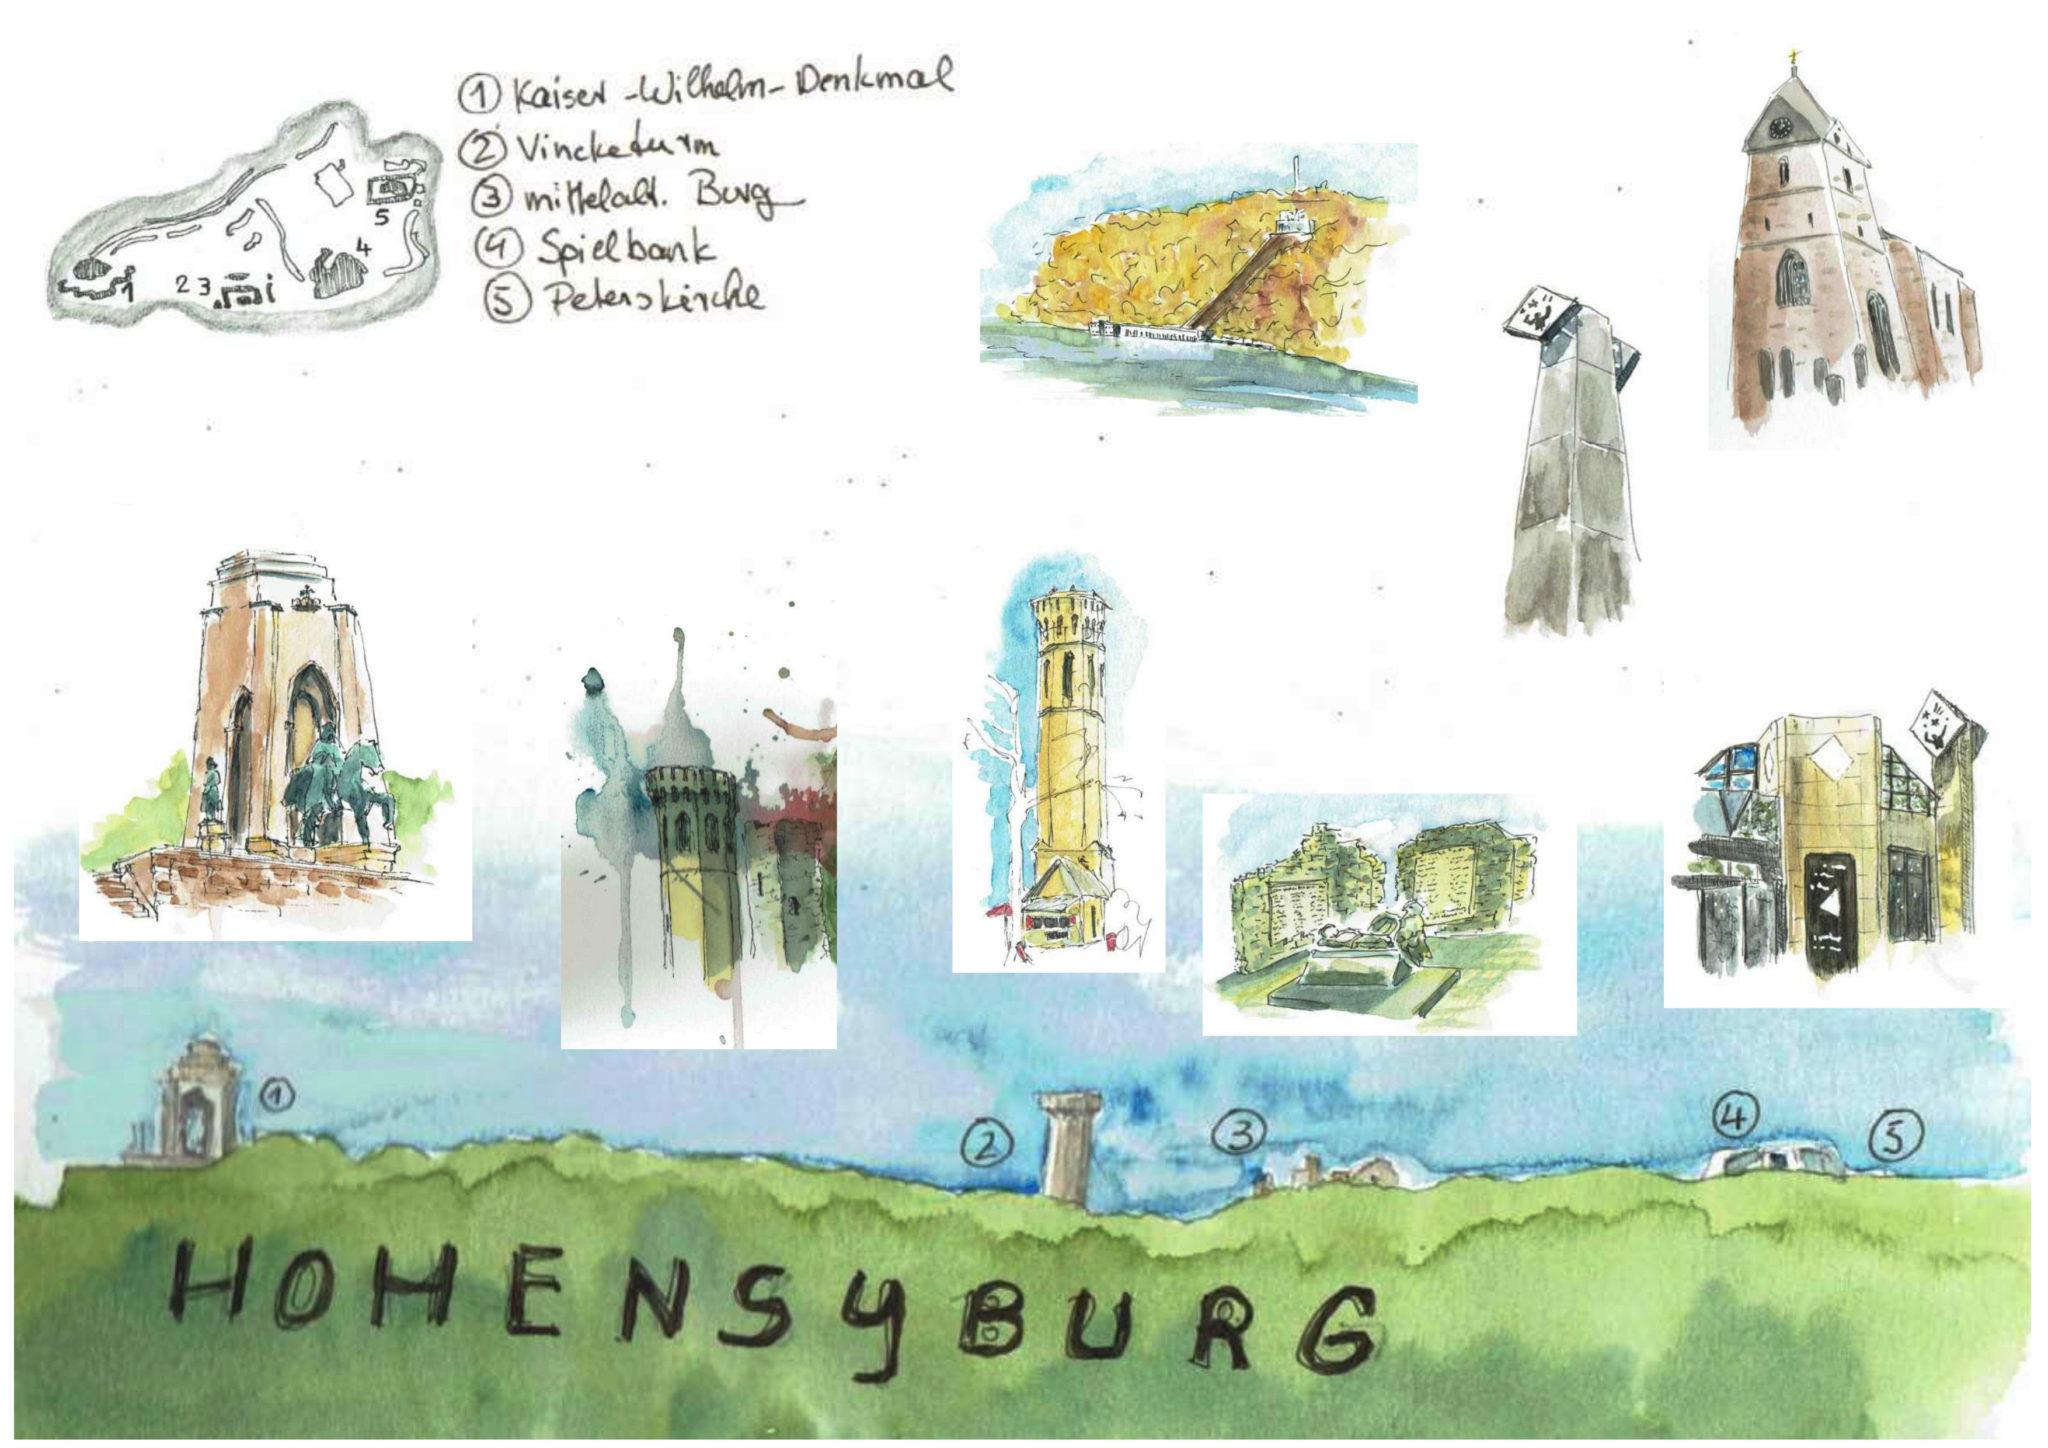 Brigitte Tolxdorf - Hohensyburg